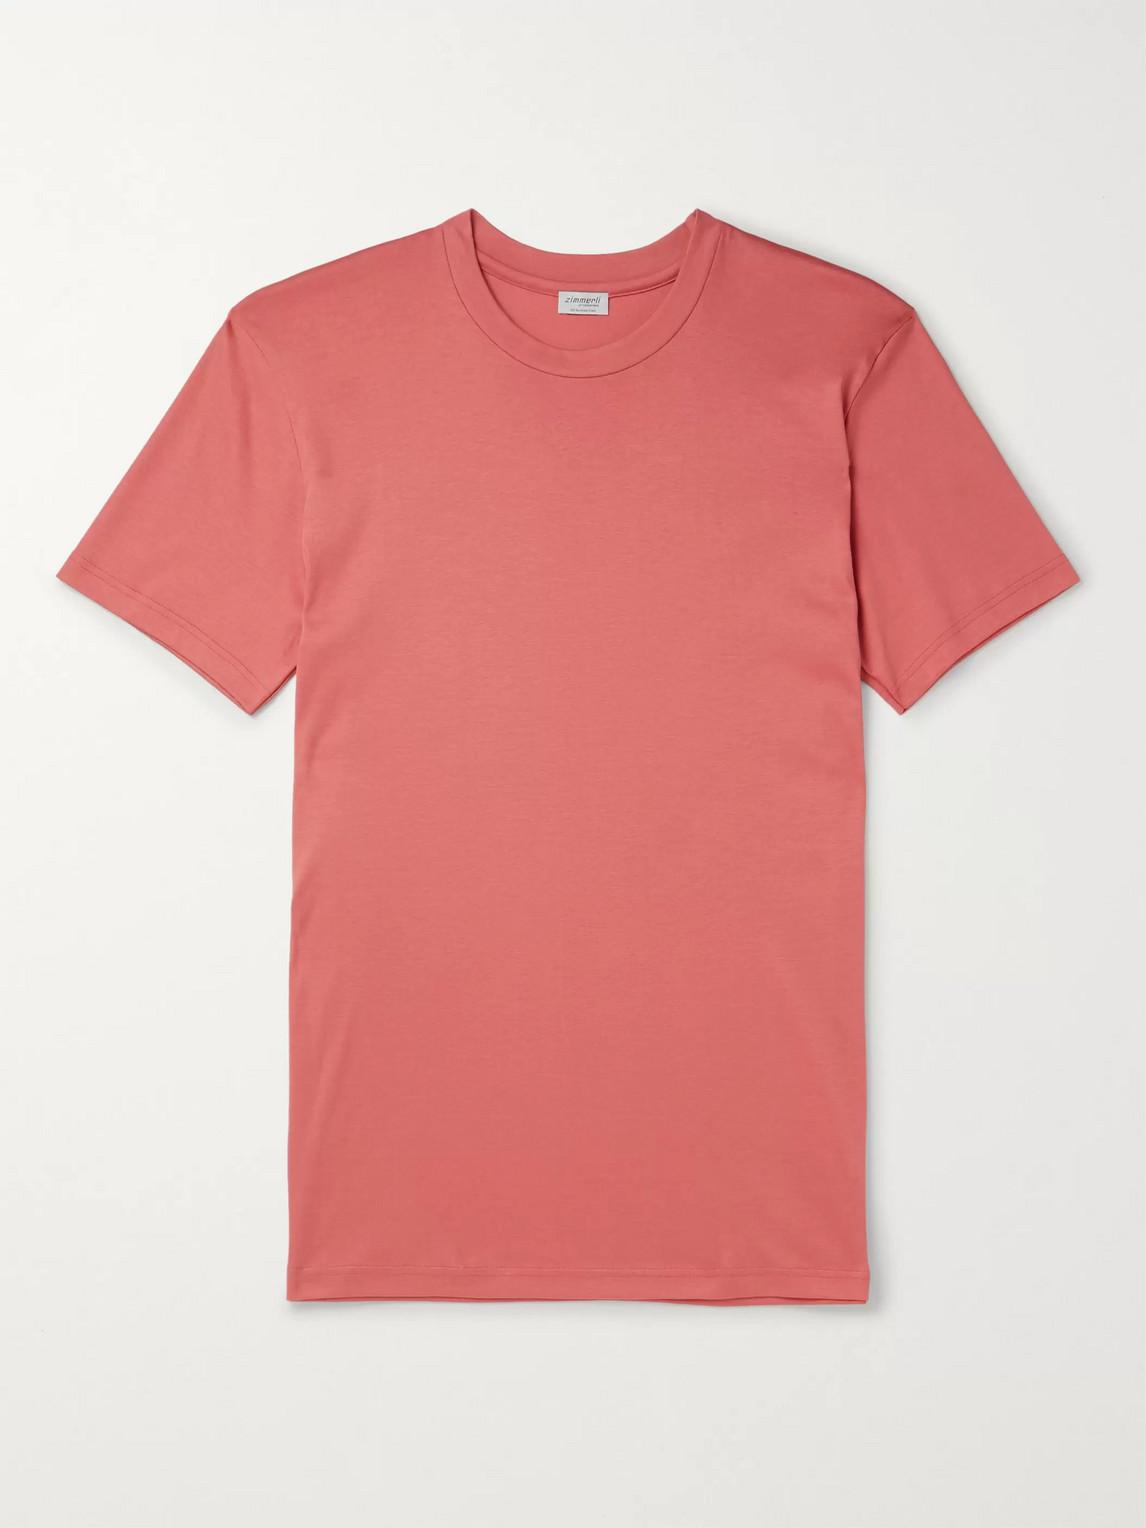 Zimmerli - Cotton-Jersey T-Shirt - Men - Red